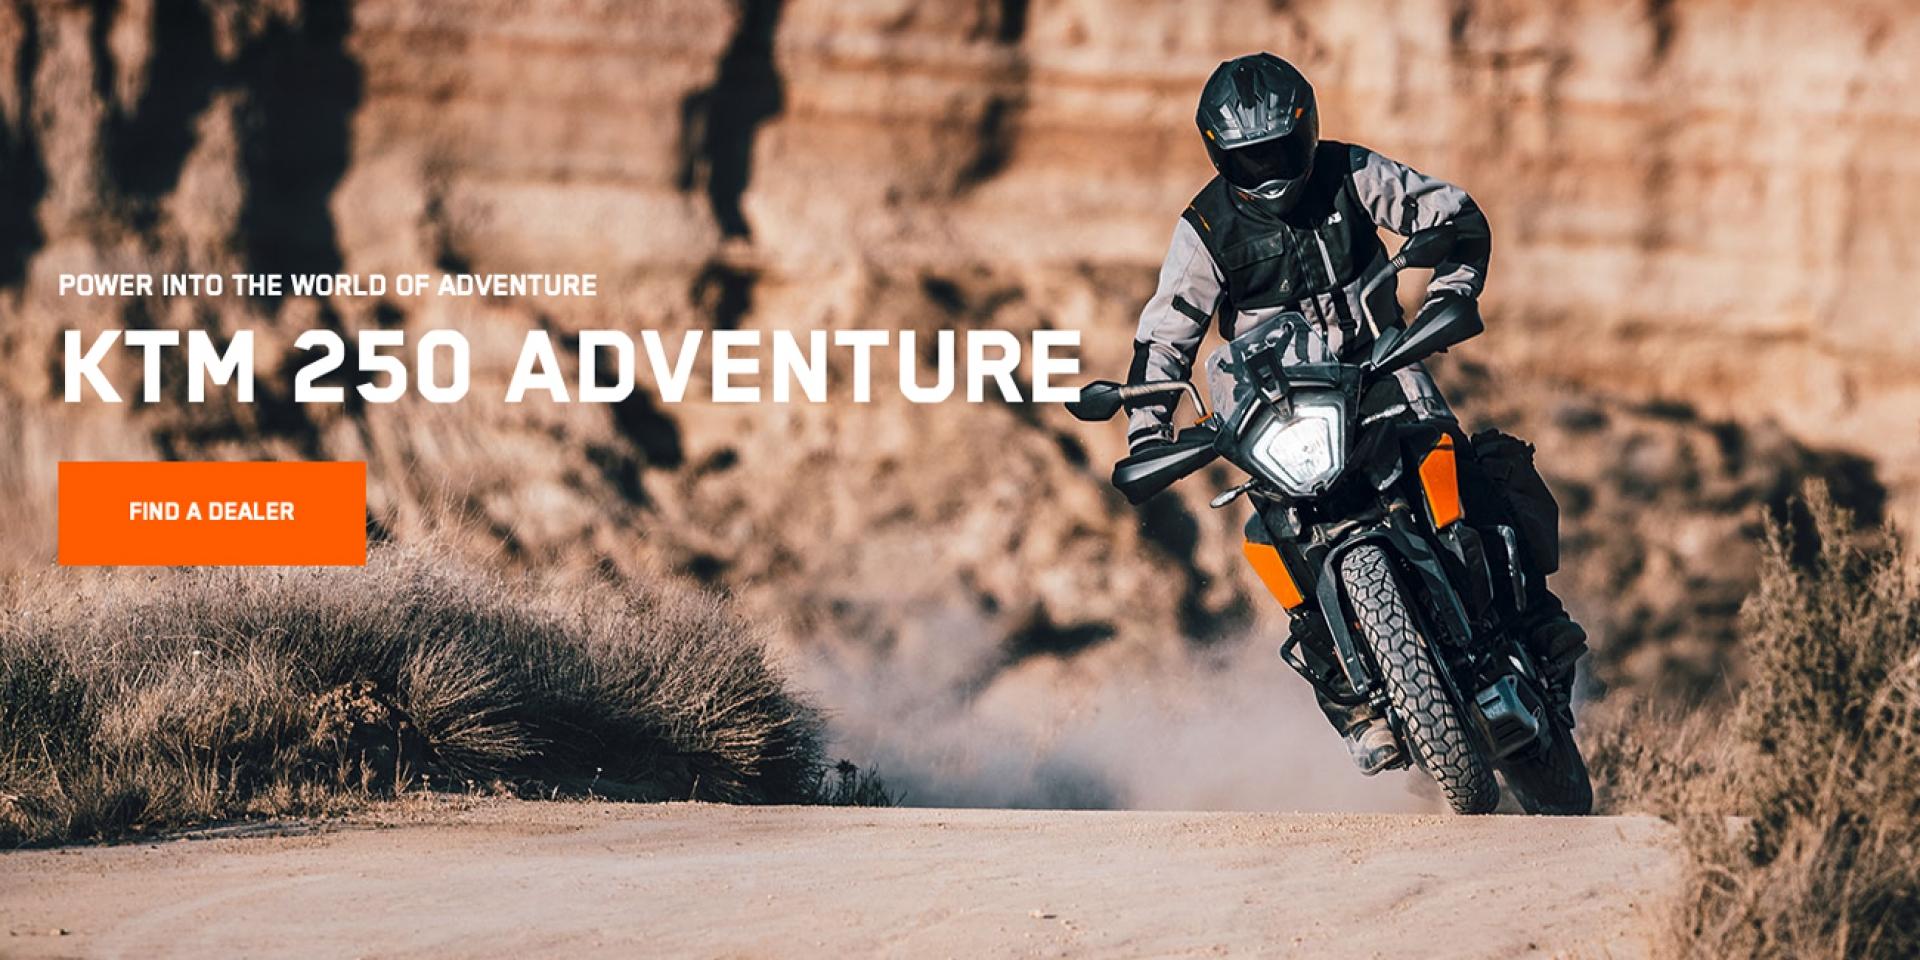 off-Road ABS搭載。KTM 250 ADVENTURE印度發表!